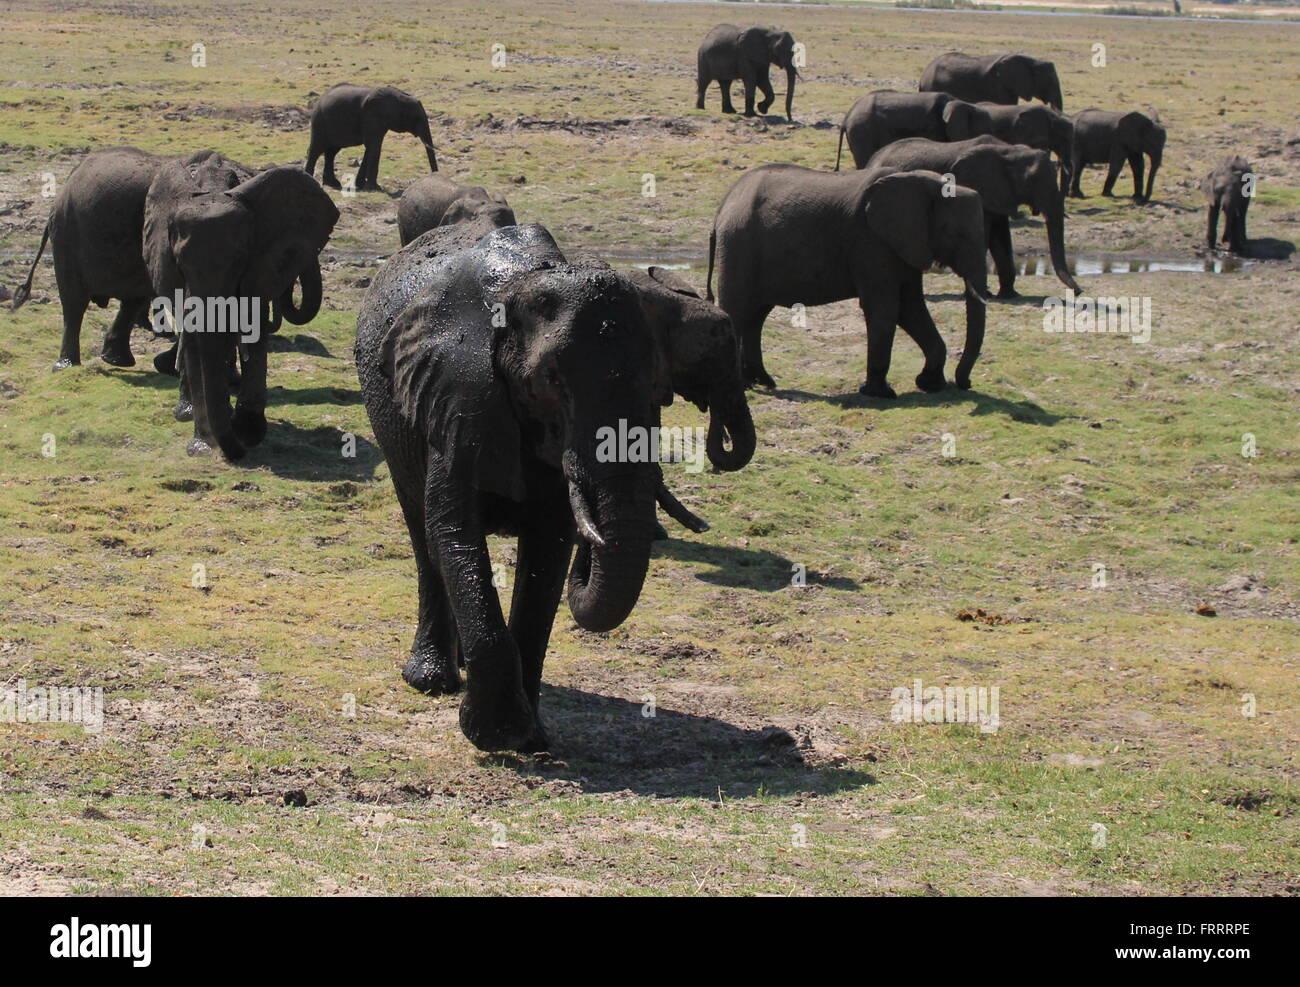 Elephant herd walking along the banks of the chobe river, Botswana Stock Photo